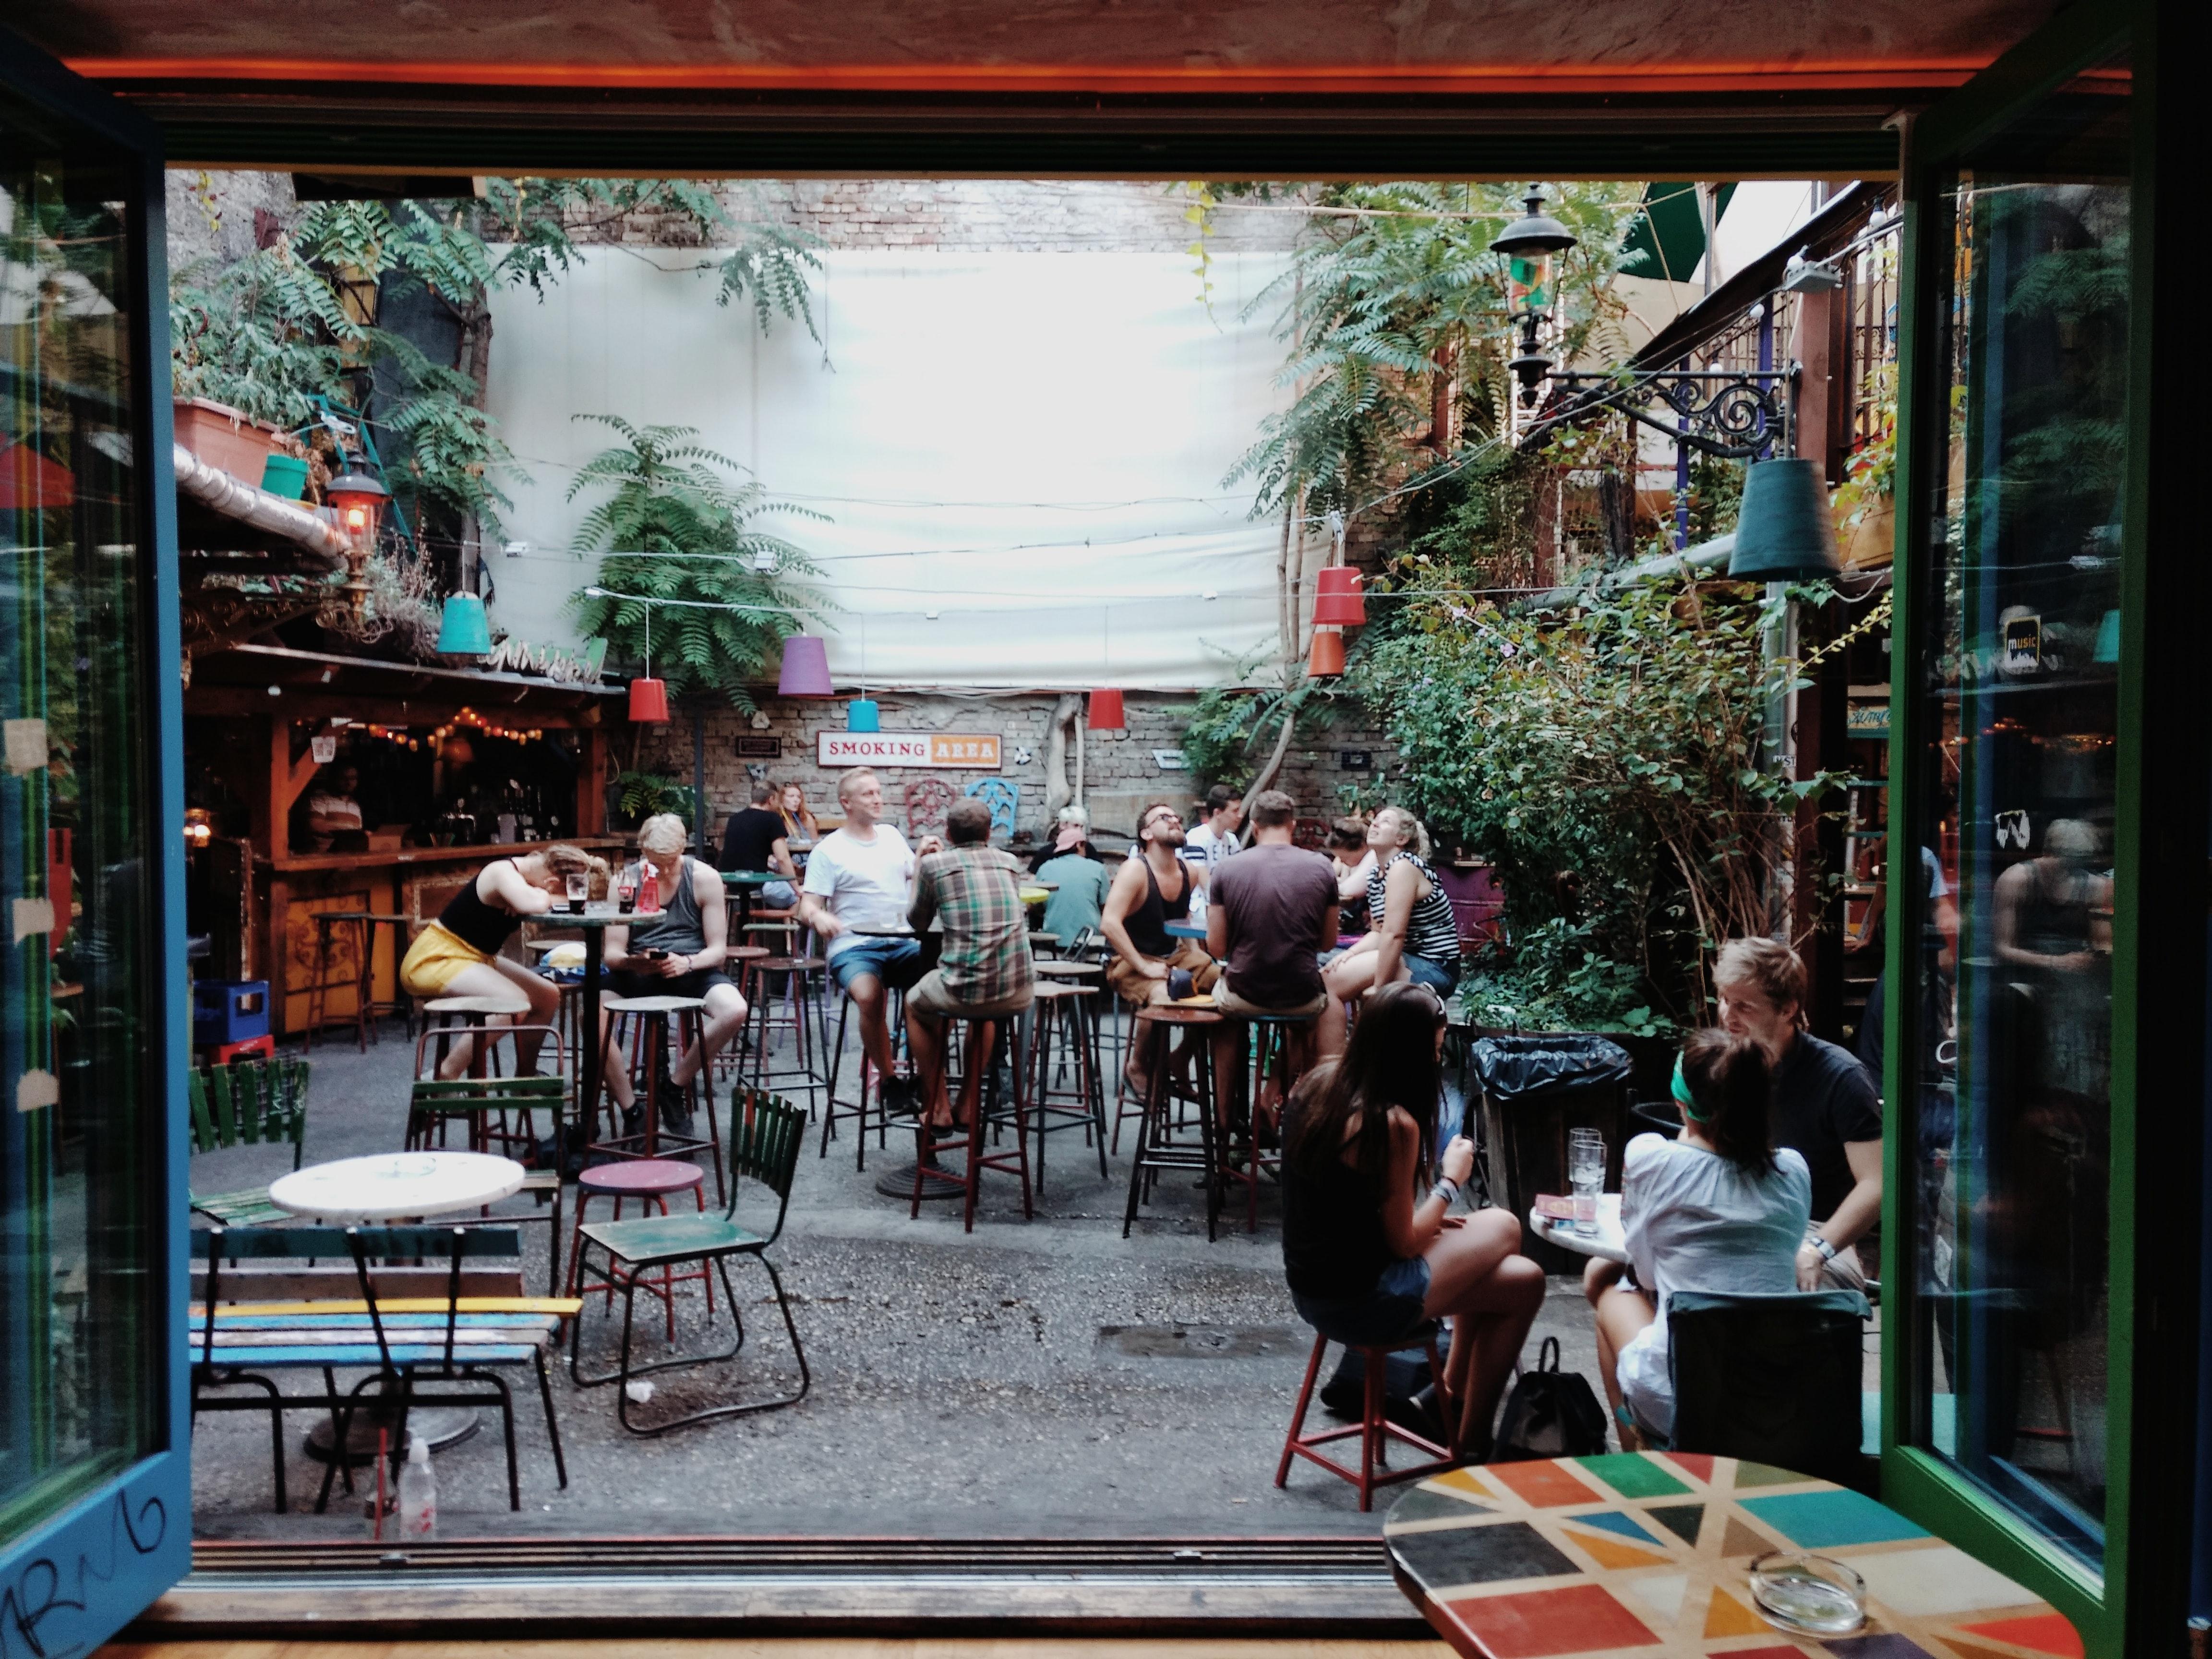 beer garden for students in dundee